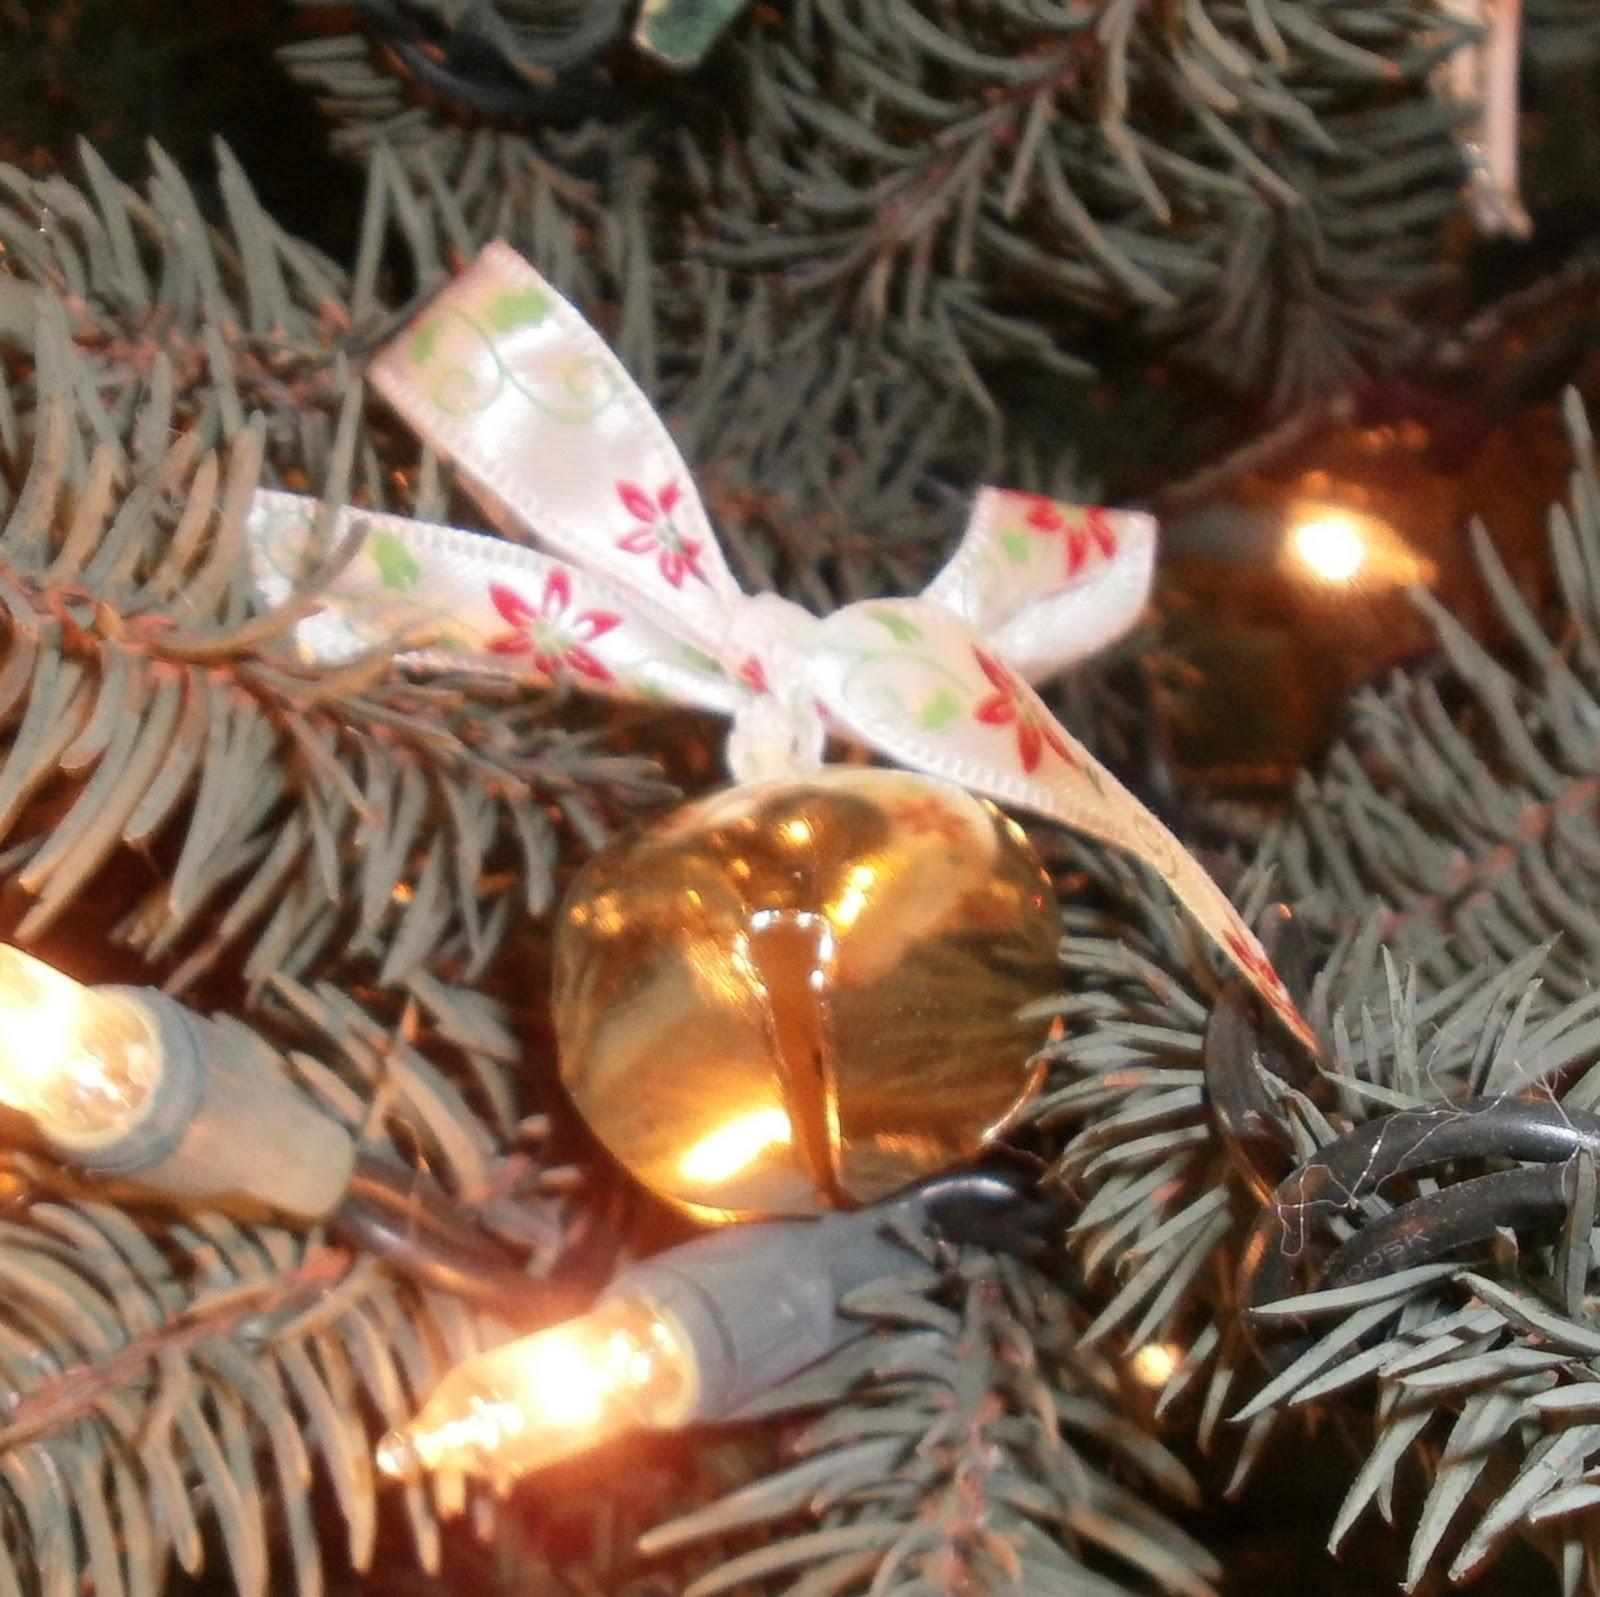 Homemade Christmas Ornaments Jingle Bells: Bell Outlet Blog: DIY Christmas Ornaments With Jingle Bells